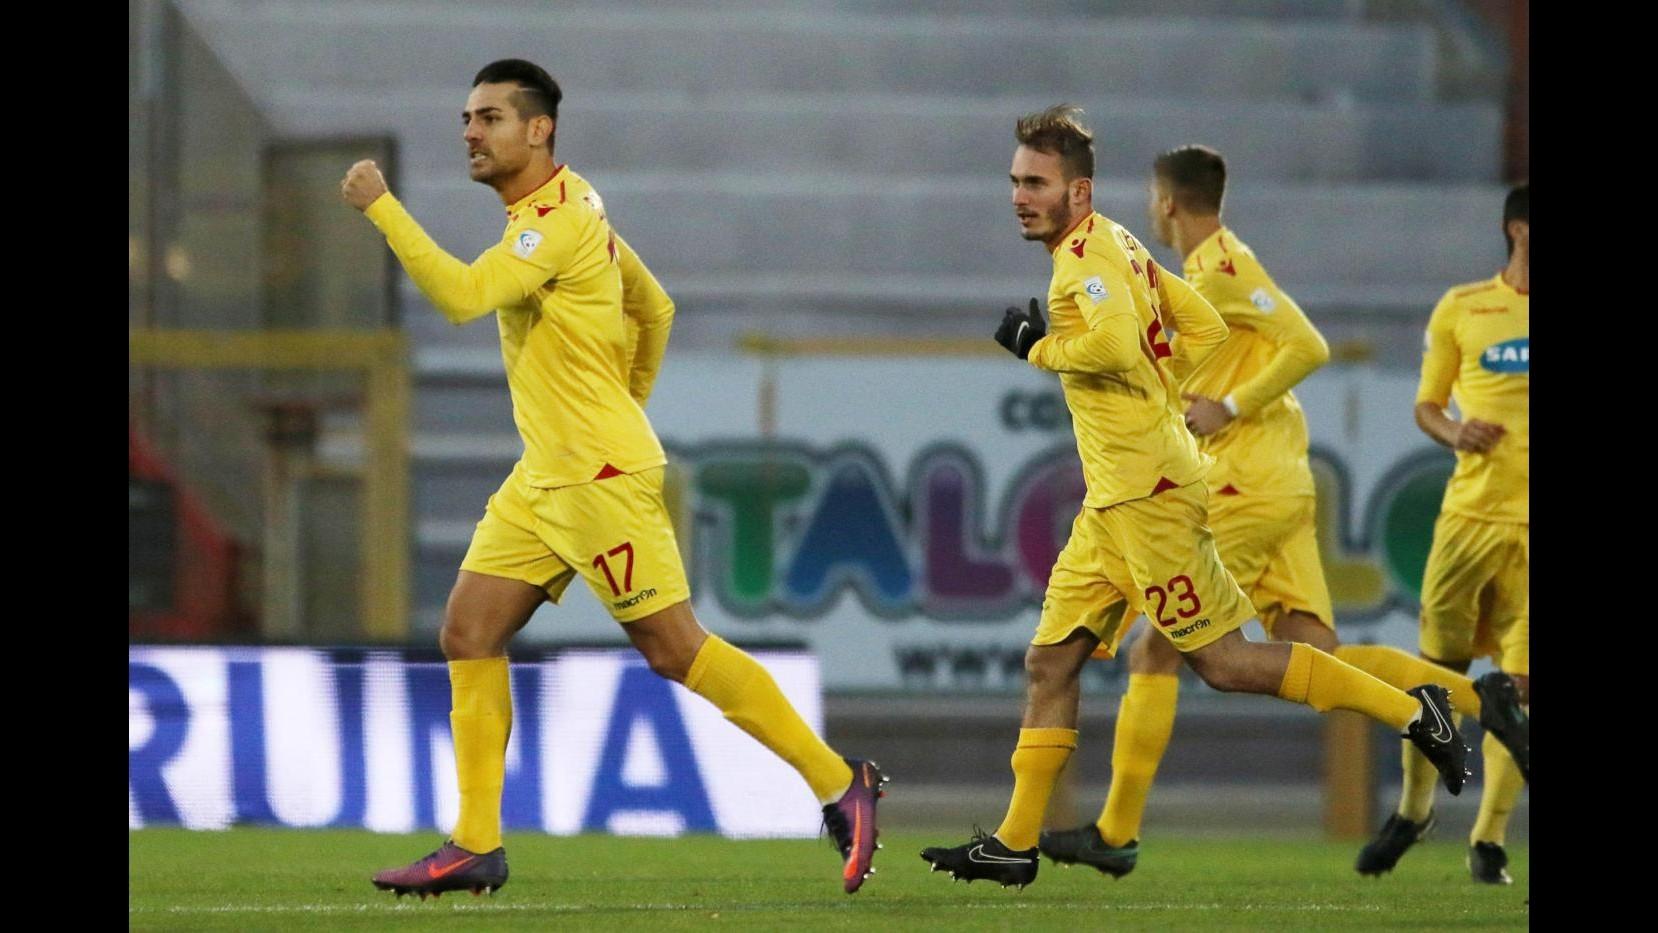 Lega Pro, Vicenza-Ravenna 0-2: il fotoracconto